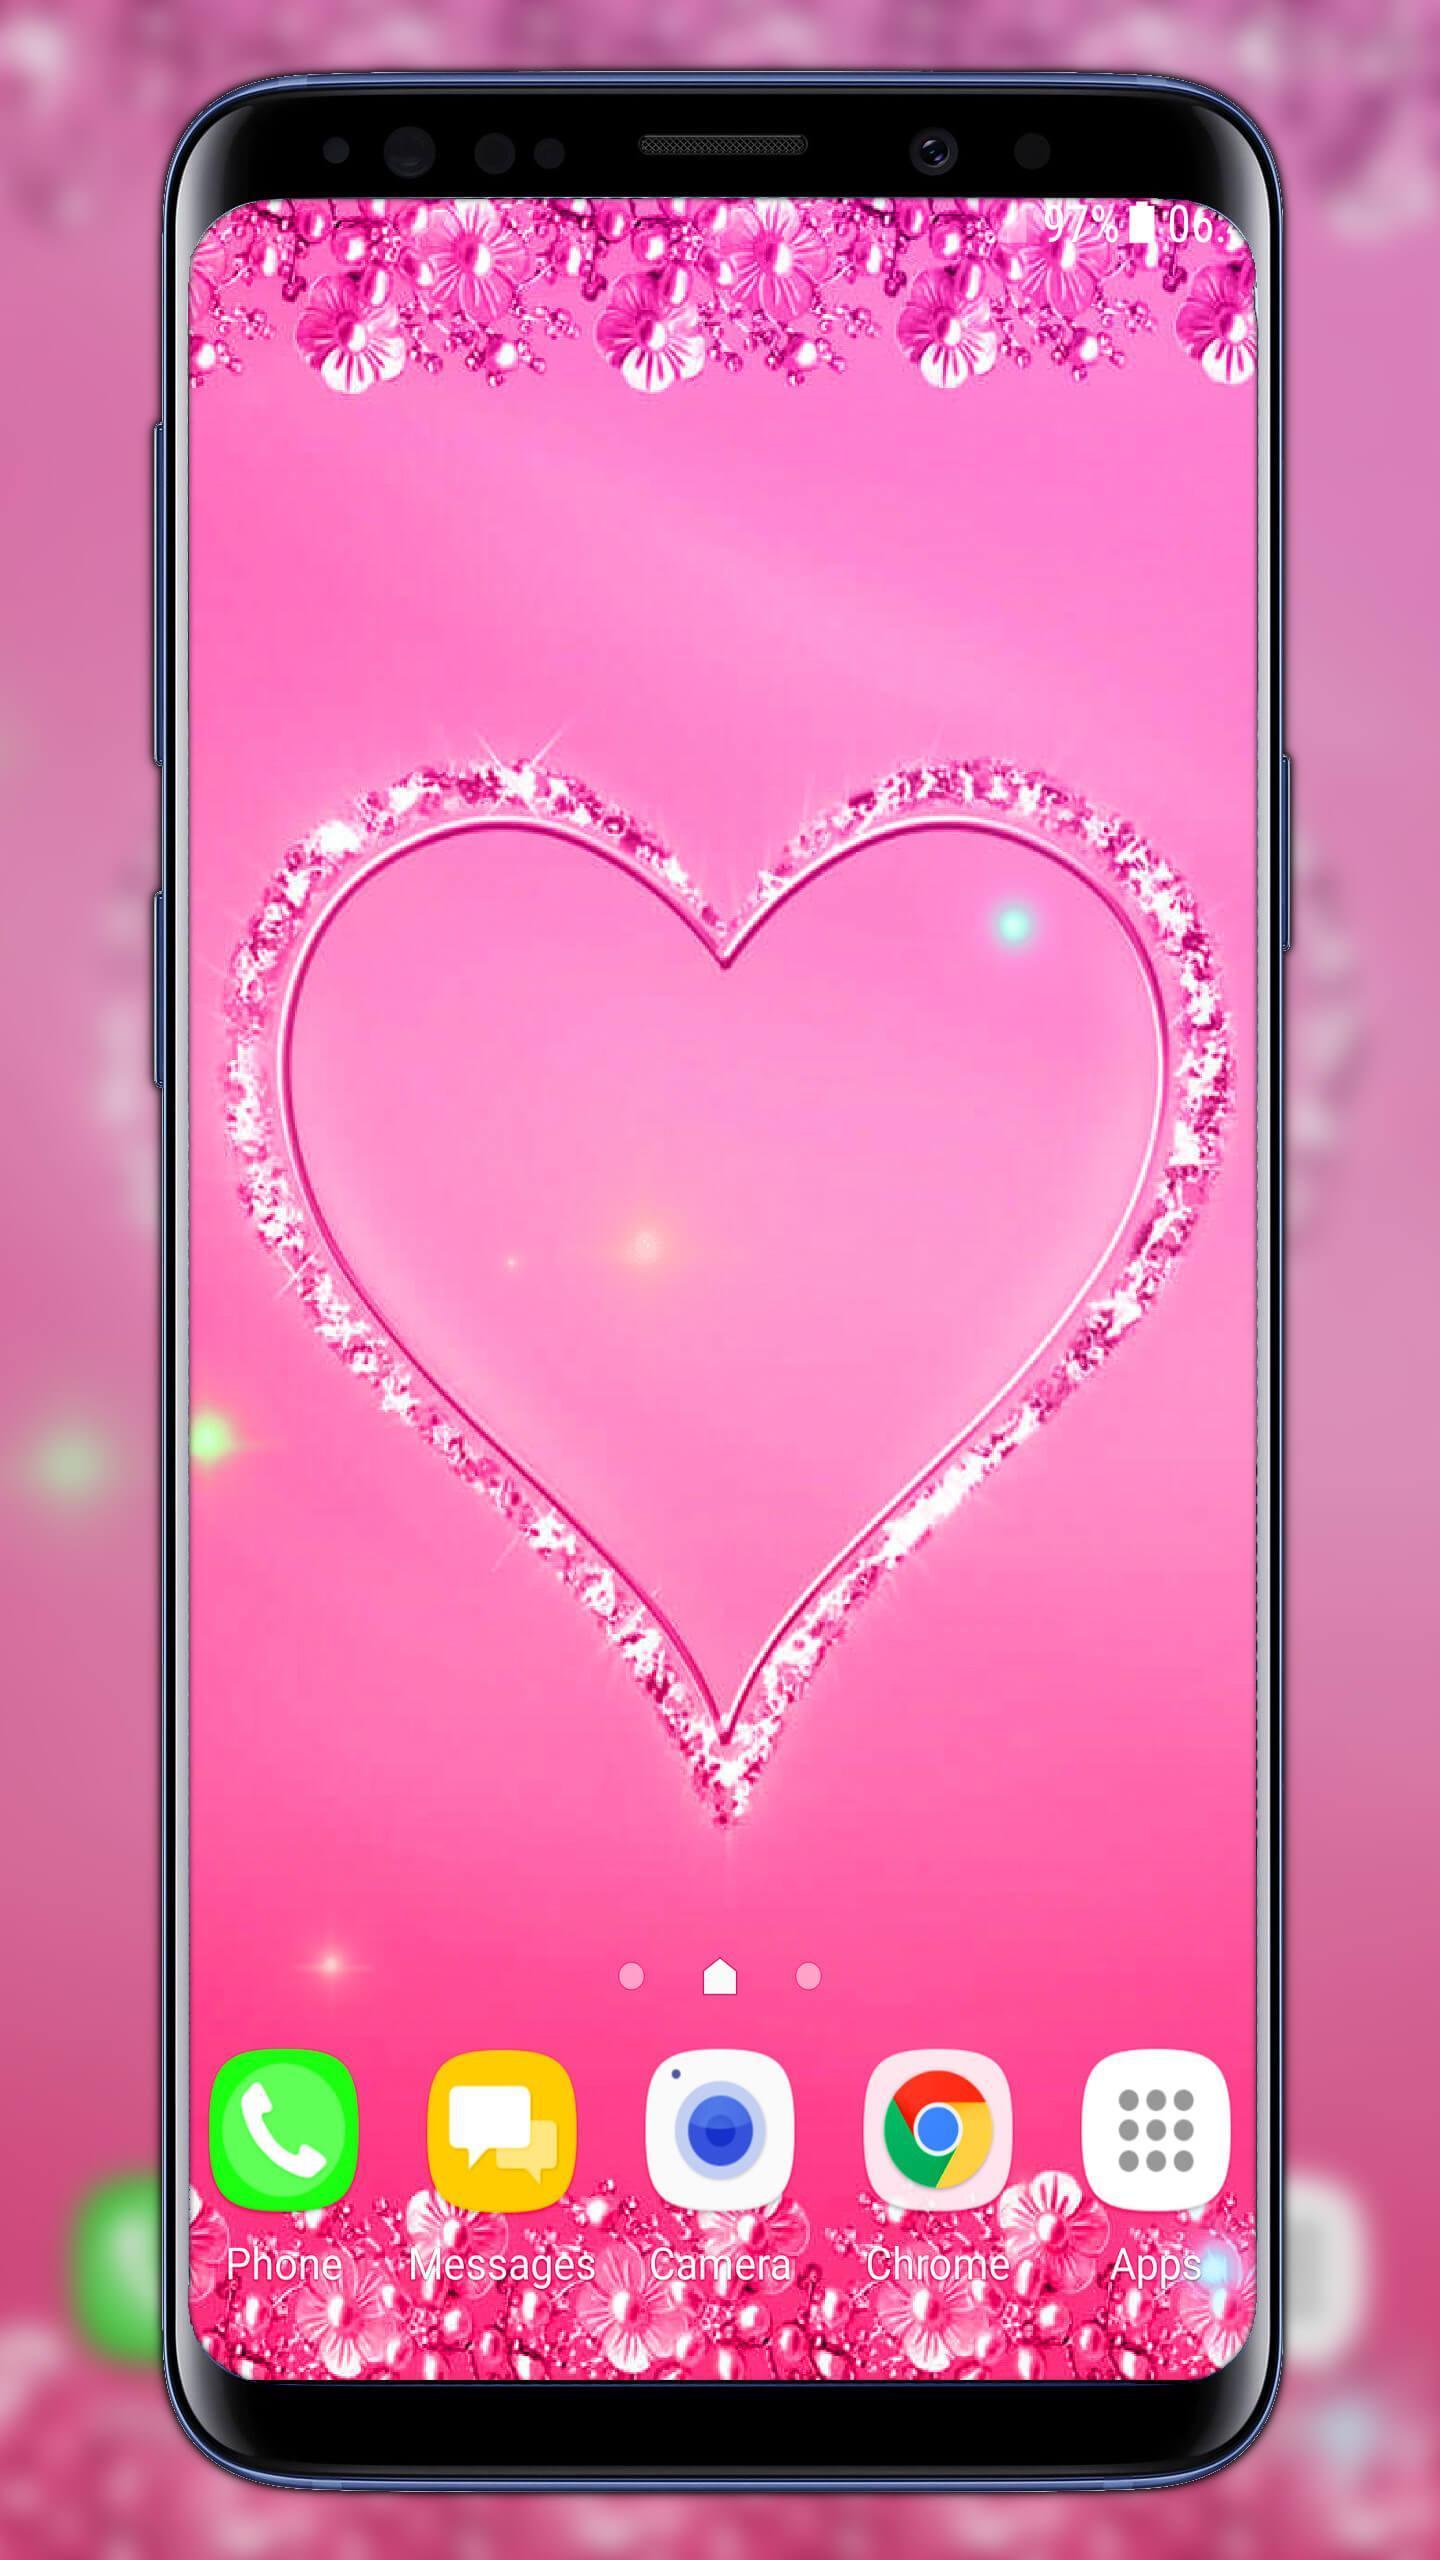 خلفيات باللون الوردي For Android Apk Download